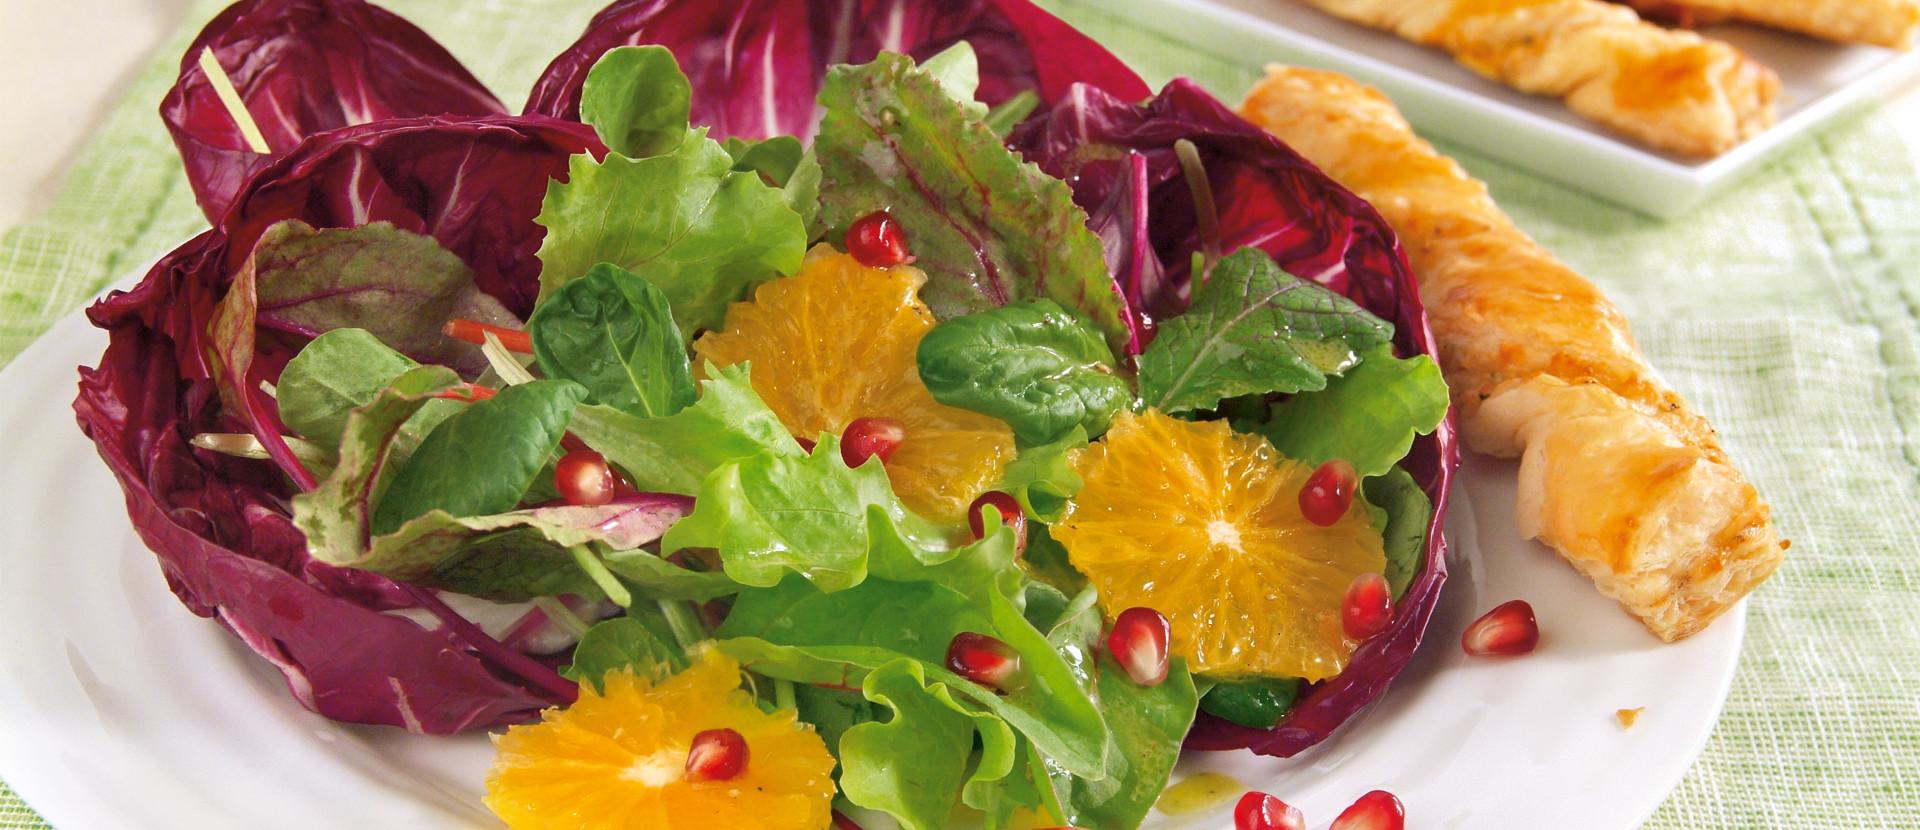 Granatapfel-Blattsalat mit Knusperstangen